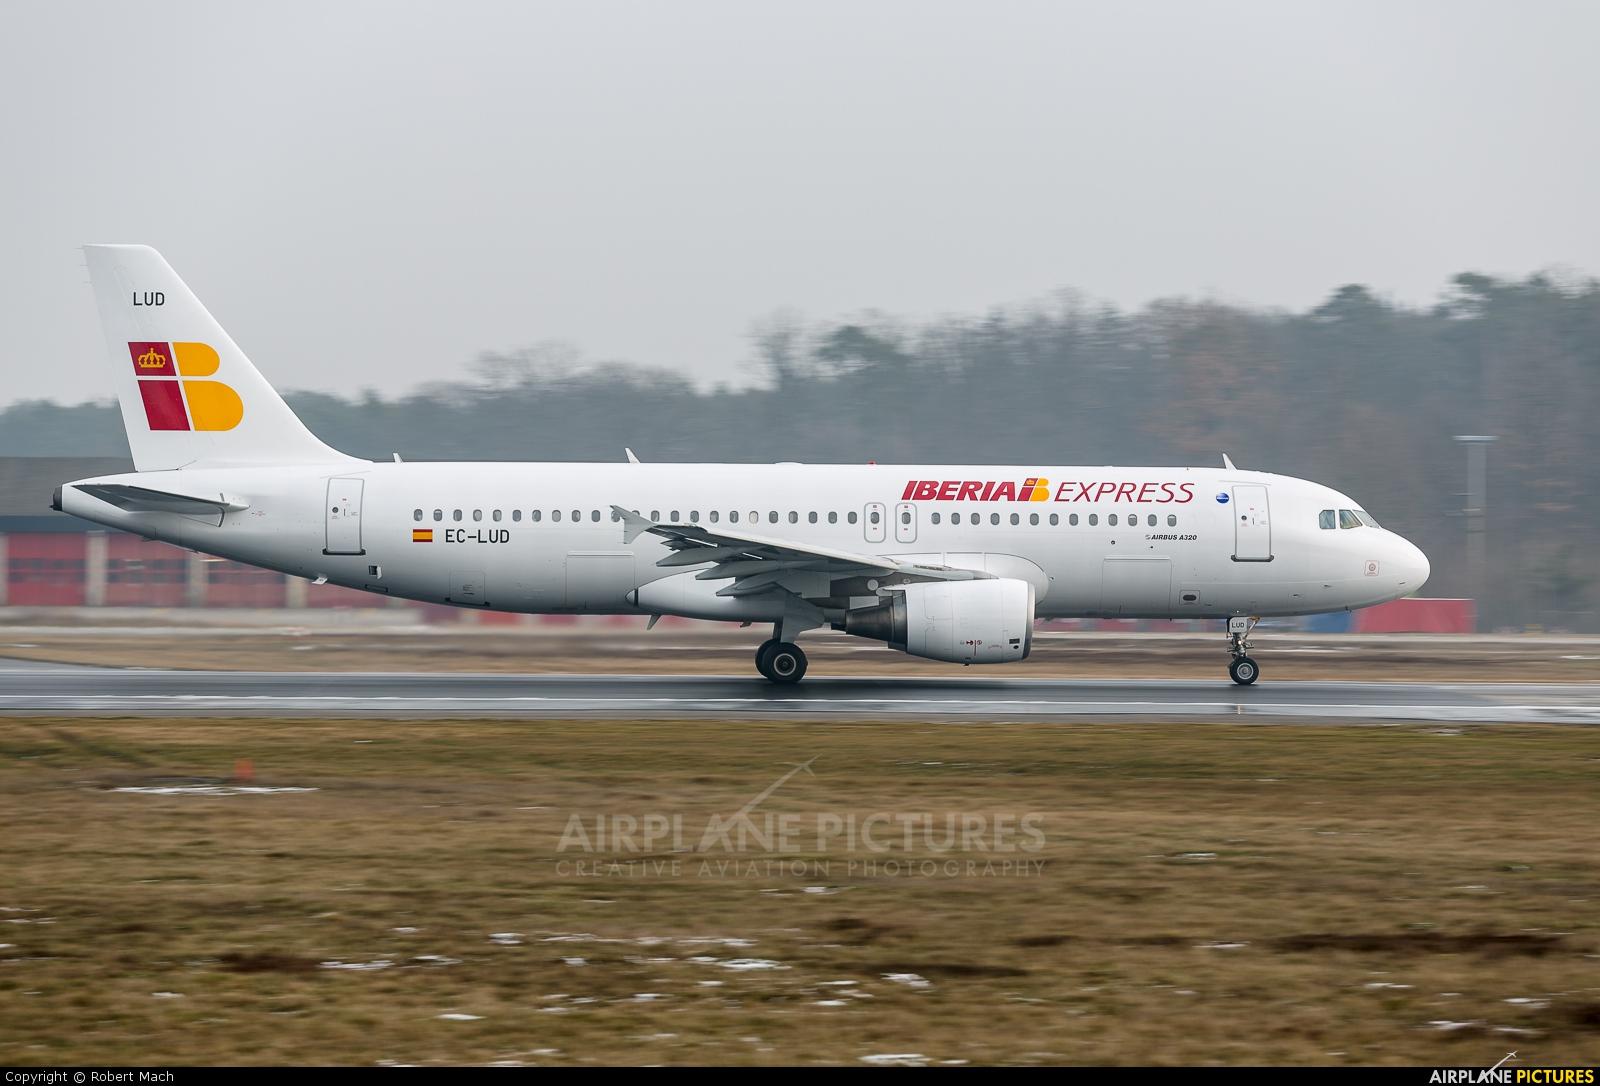 Iberia Express EC-LUD aircraft at Frankfurt